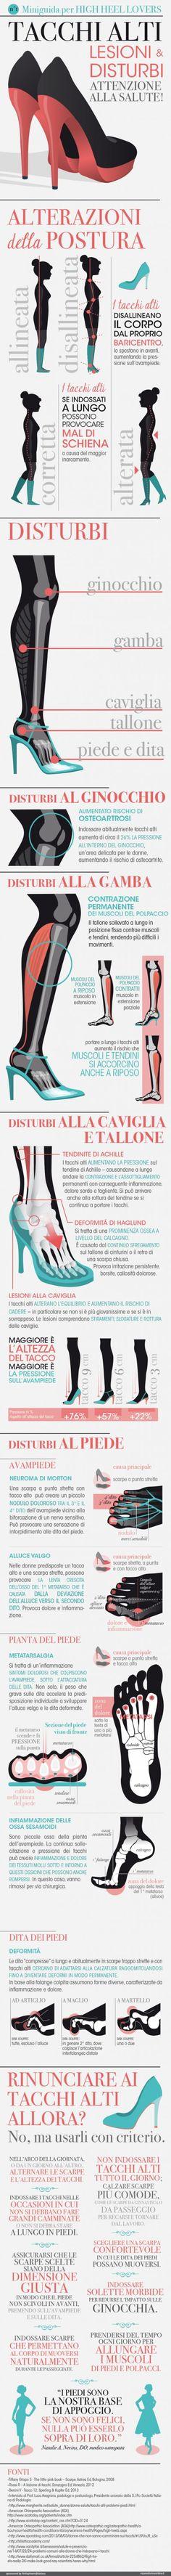 Miniguida per high Heel lovers: attenzione alla salute! infographics designed for esseredonnaonline.it- illustrated by Alice Kle Borghi, kleland.com